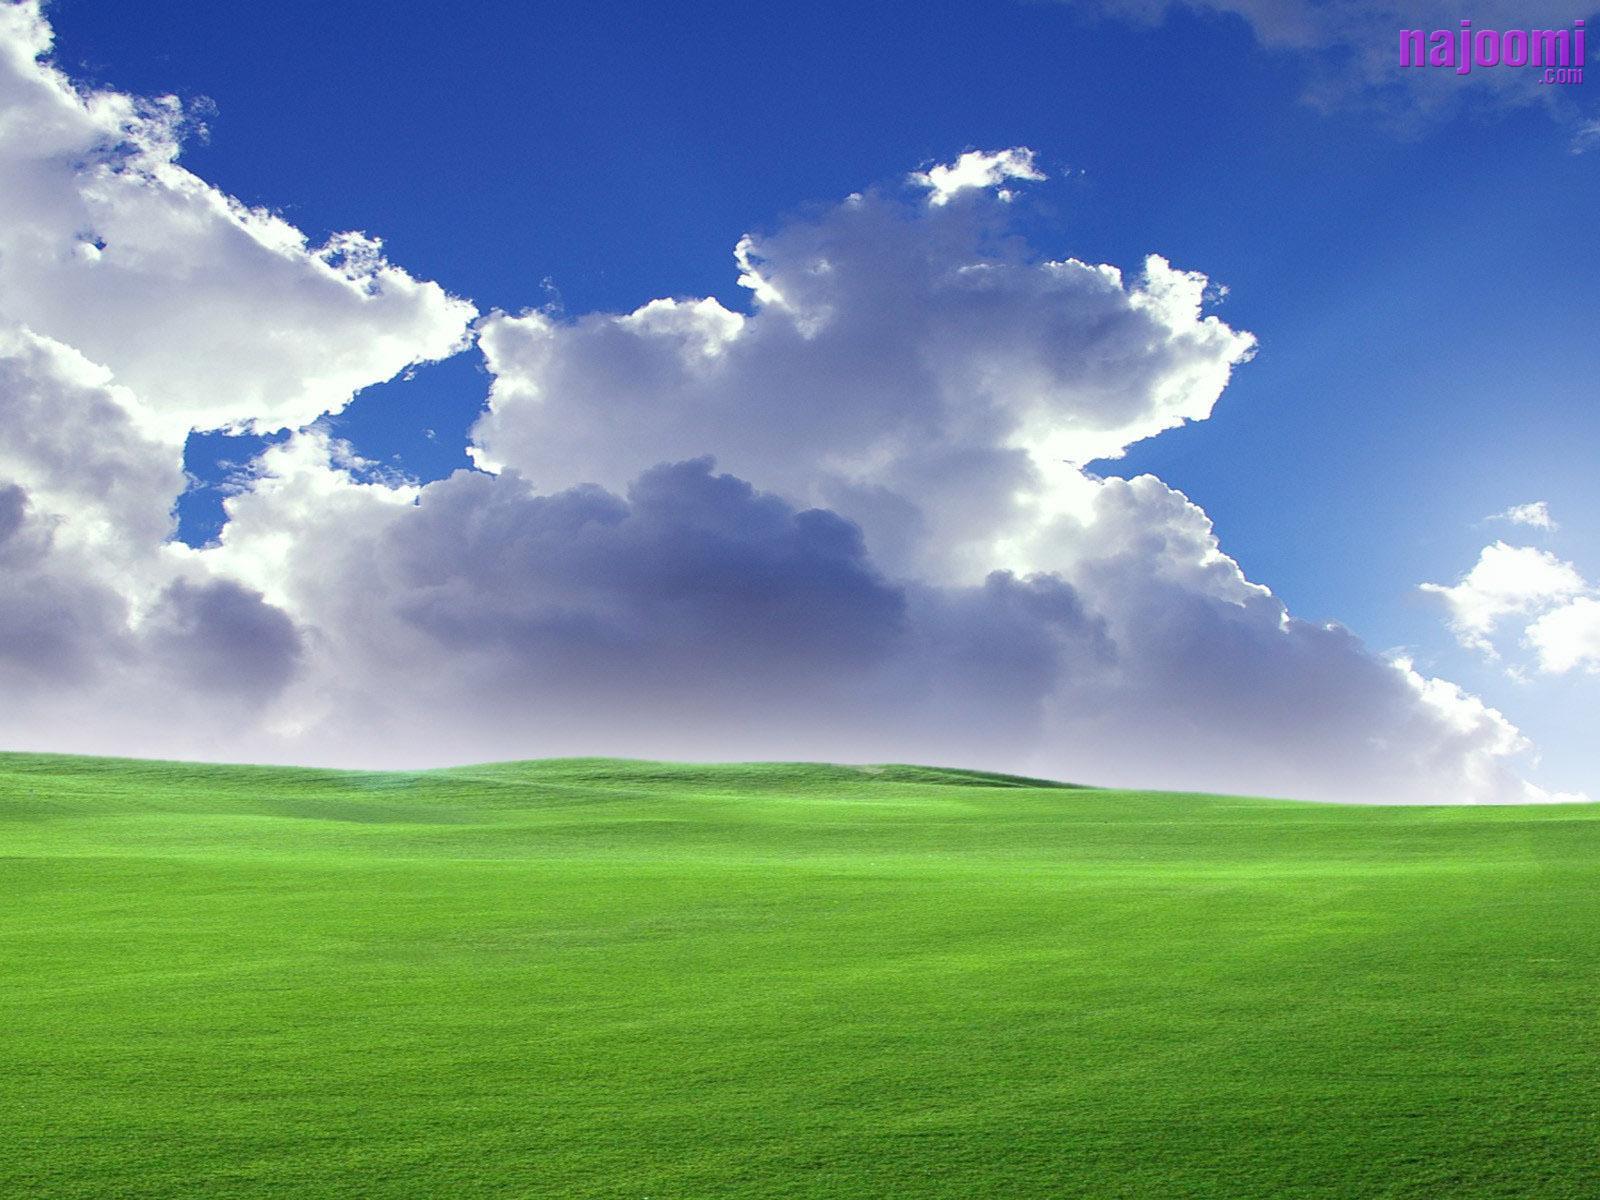 Free 3D Windows Xp Wallpapers,Vista,Nature,Animals,Fun,Entertainment: Windows Xp Wallpapers ...